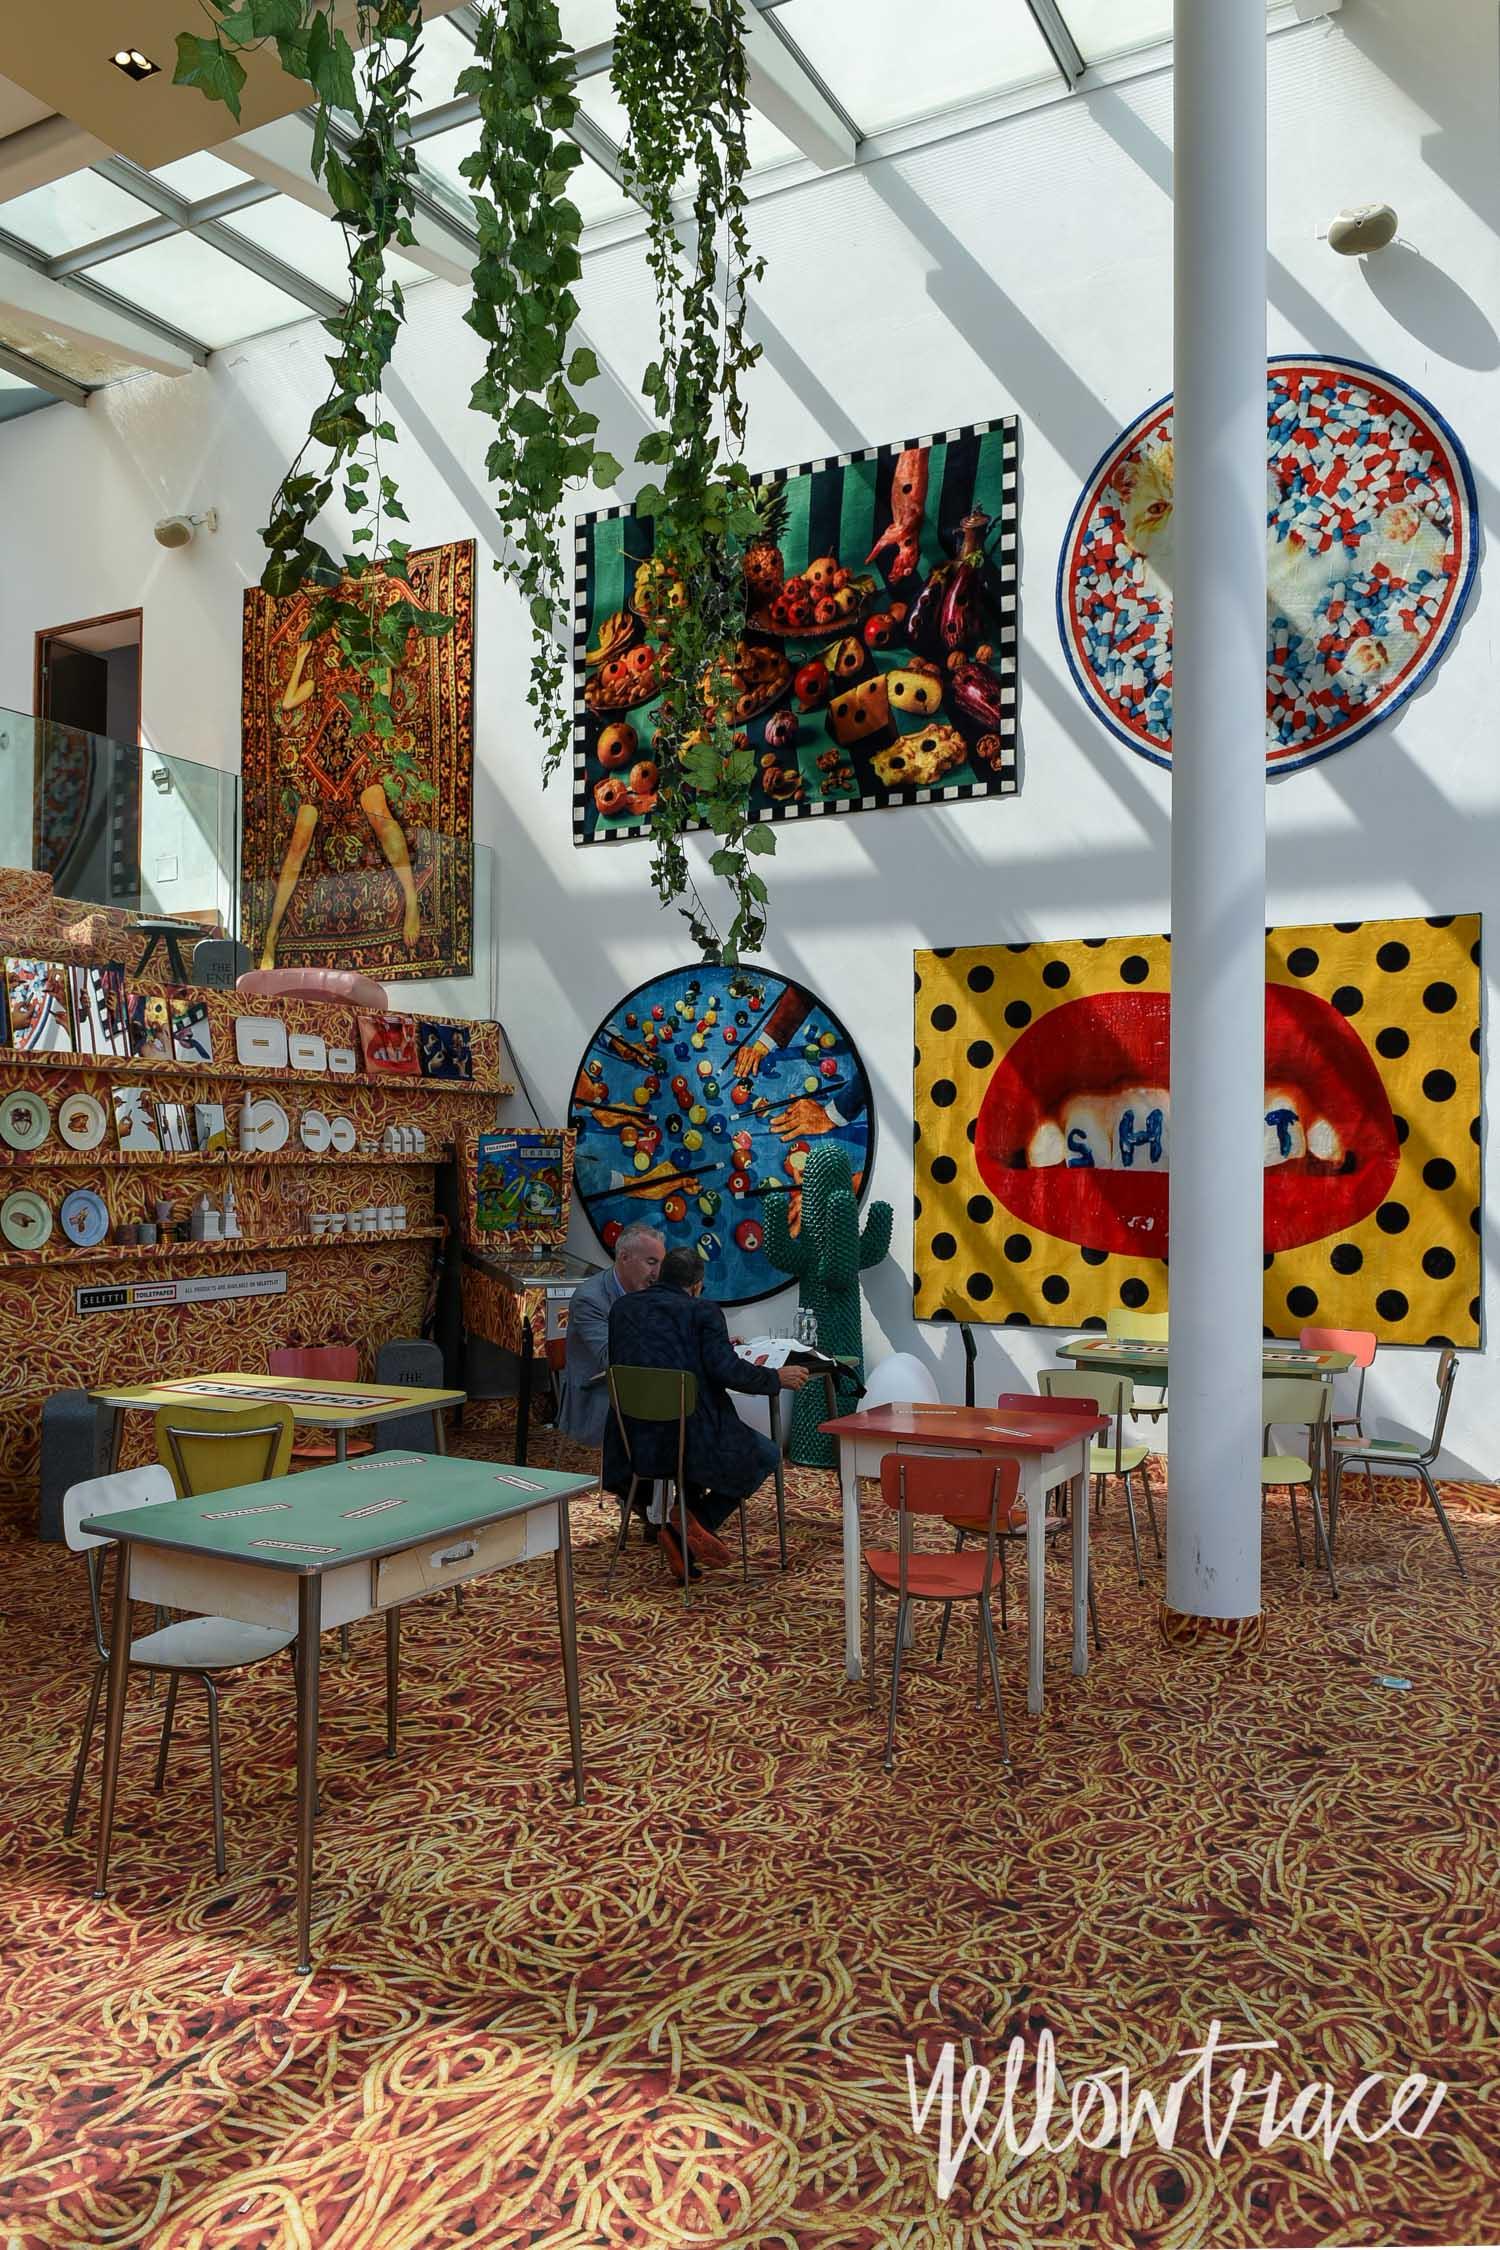 Milan Design Week 2017 Highlights, Seletti Cafe at Wallpaper Handmade, Photo © Nick Hughes | #Milantrace2017